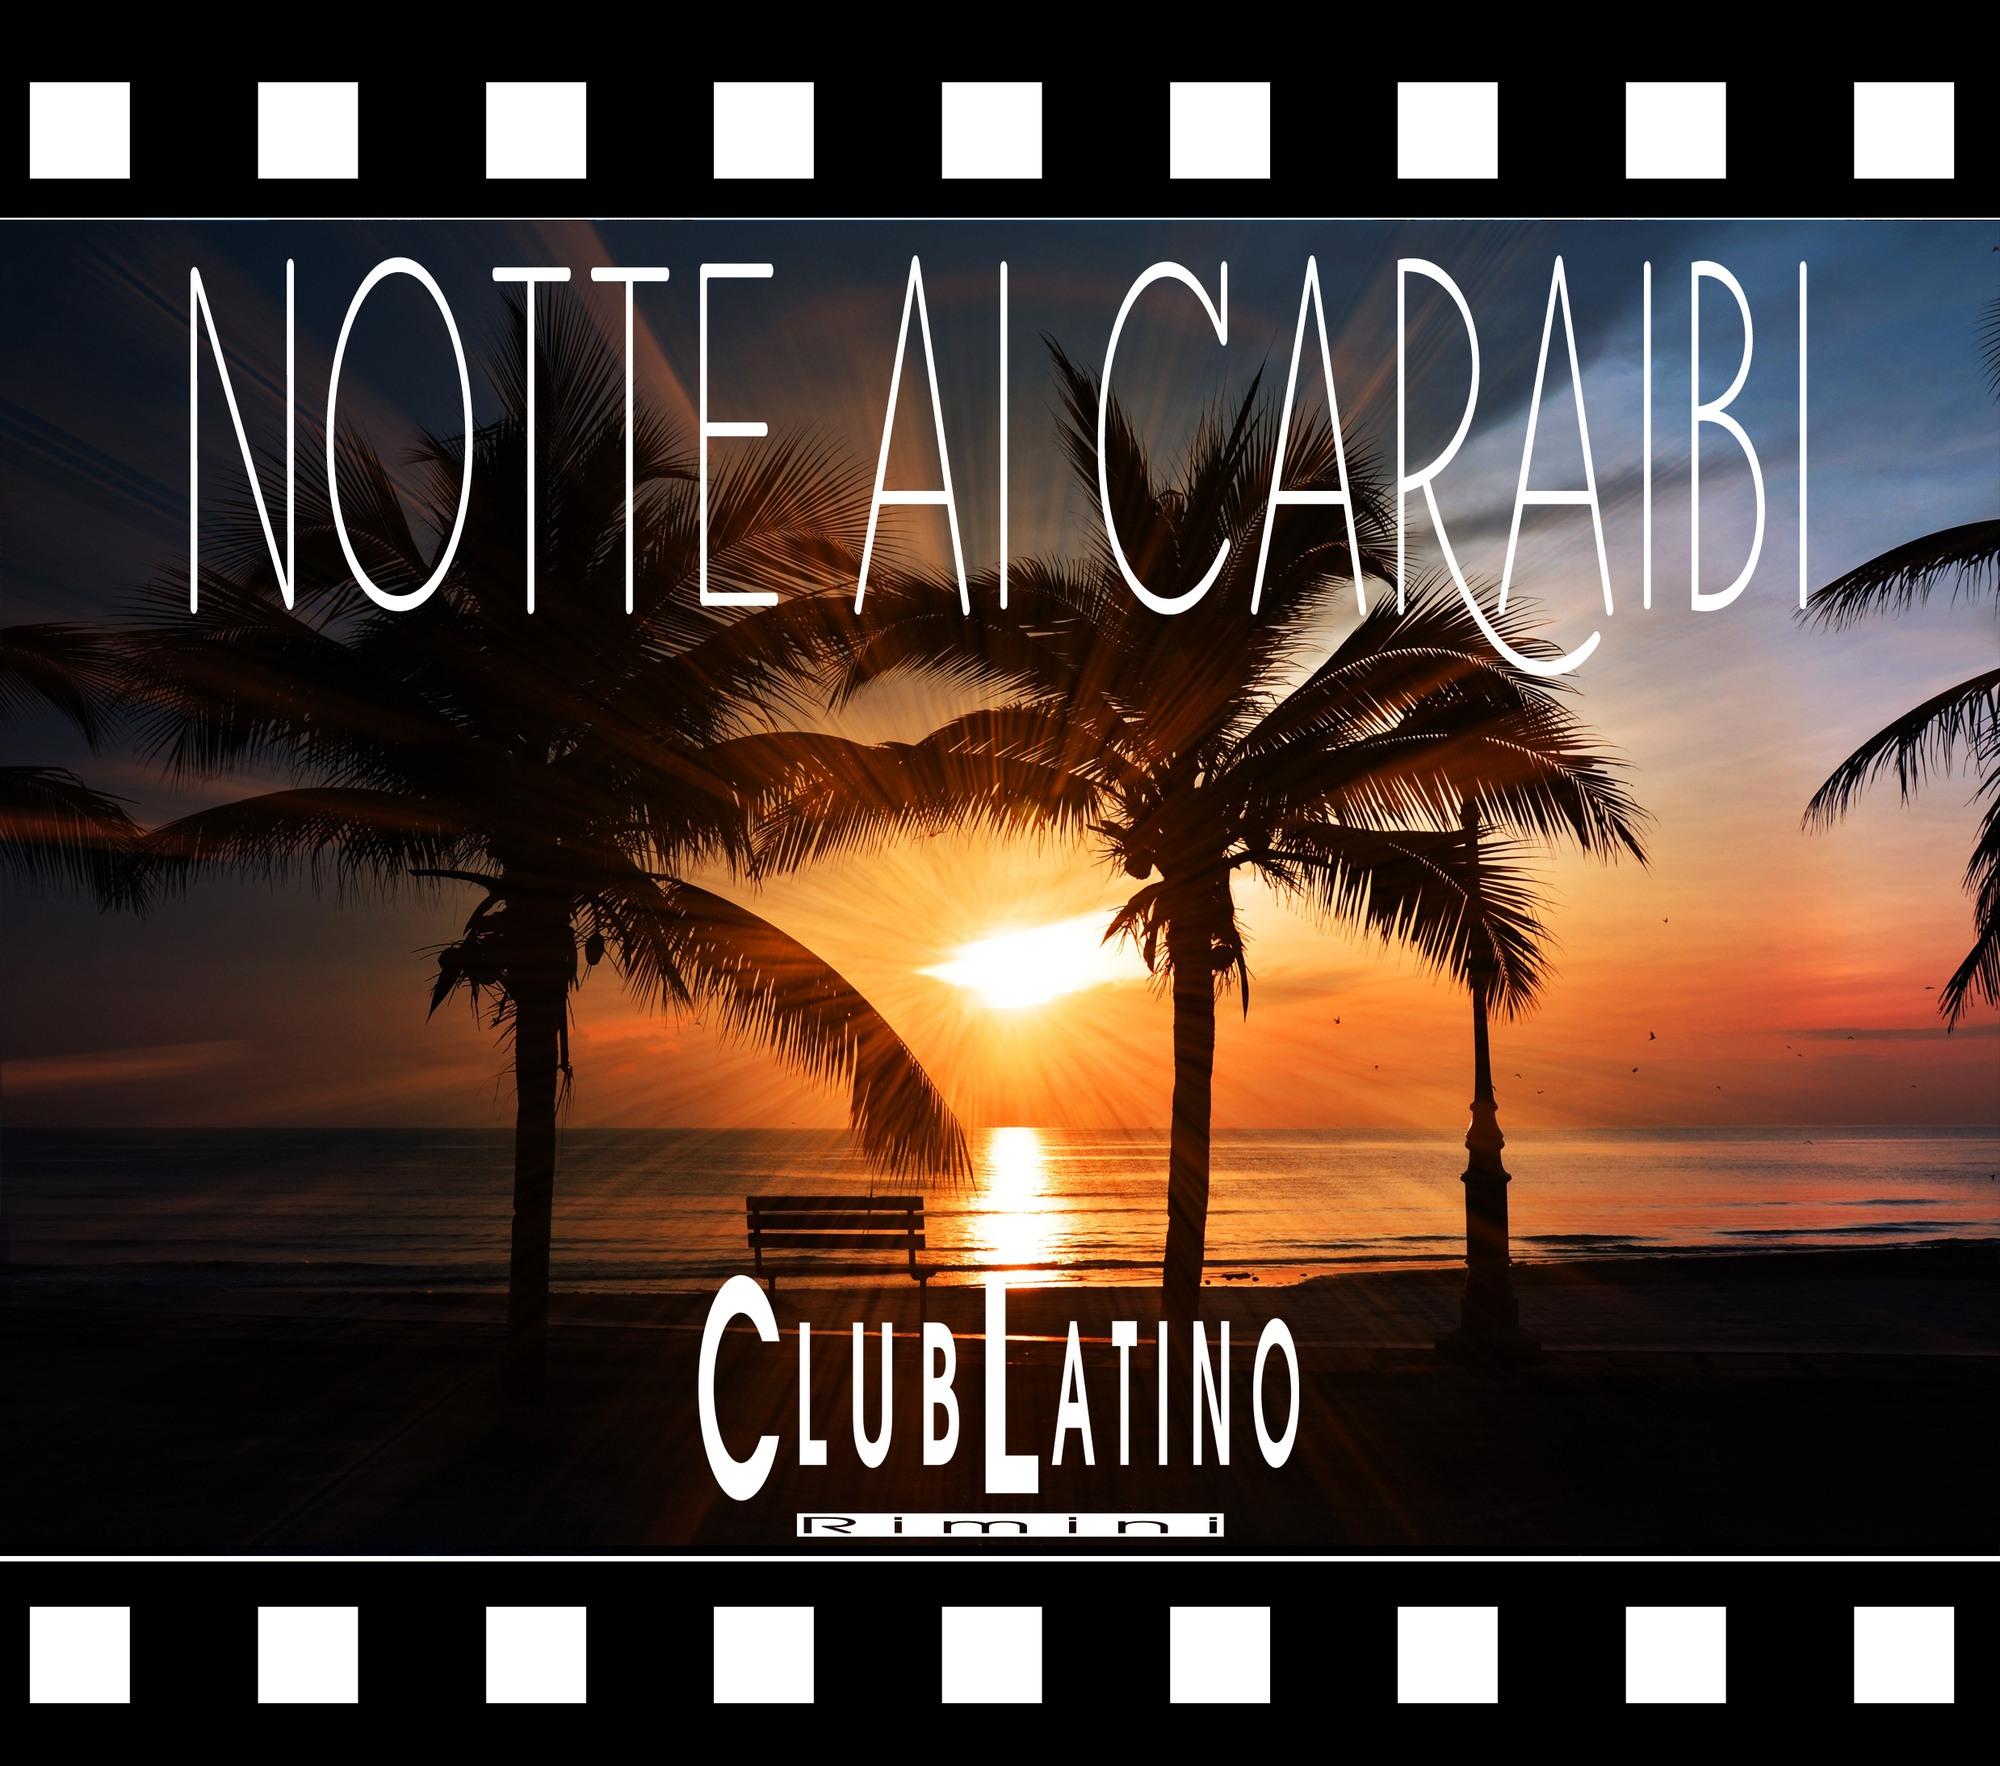 Notte Caraibi